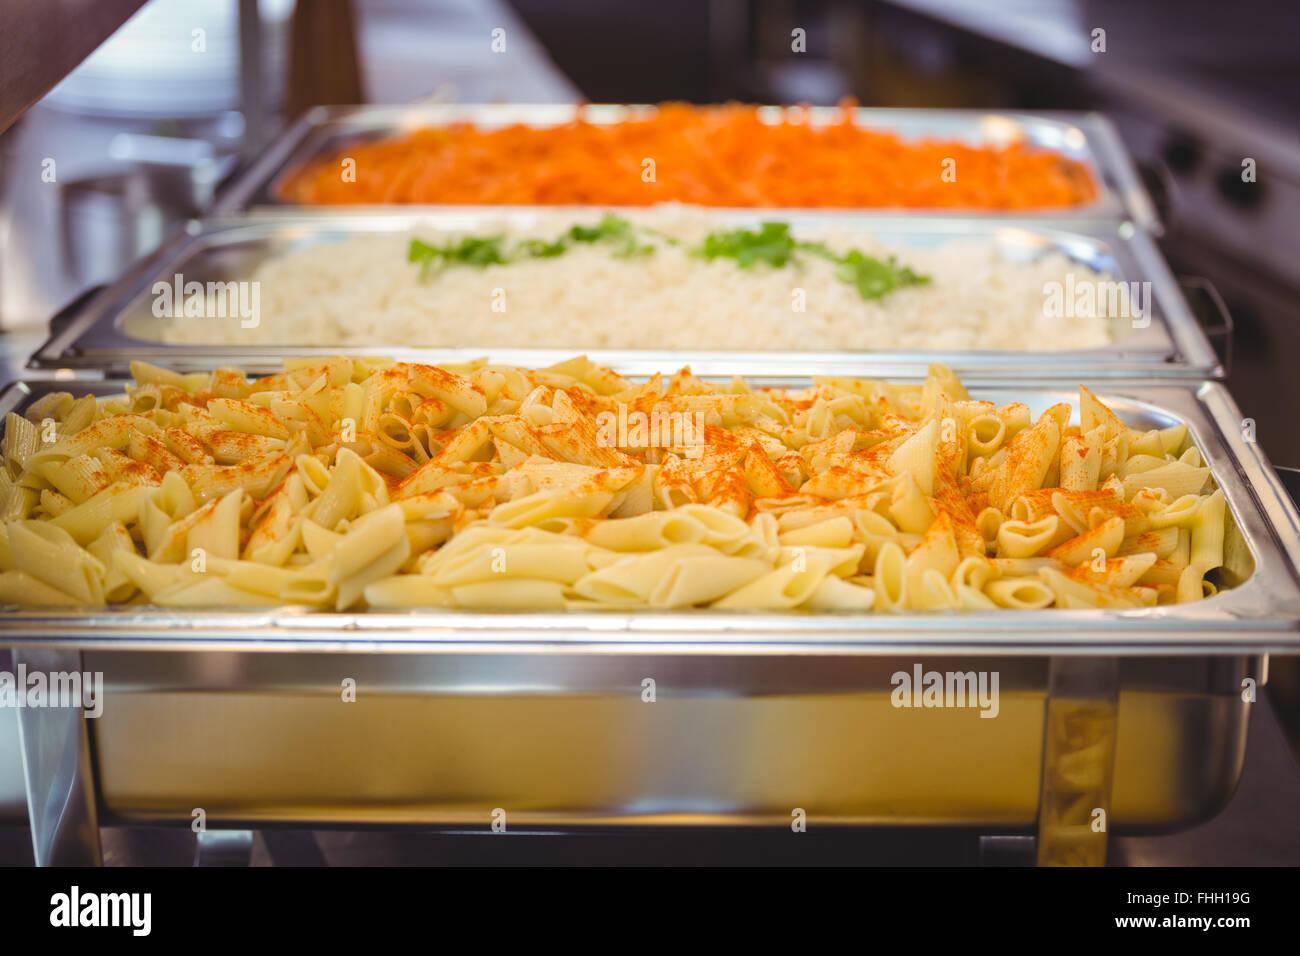 Schüsseln aus Kartoffeln und Nudeln Stockbild